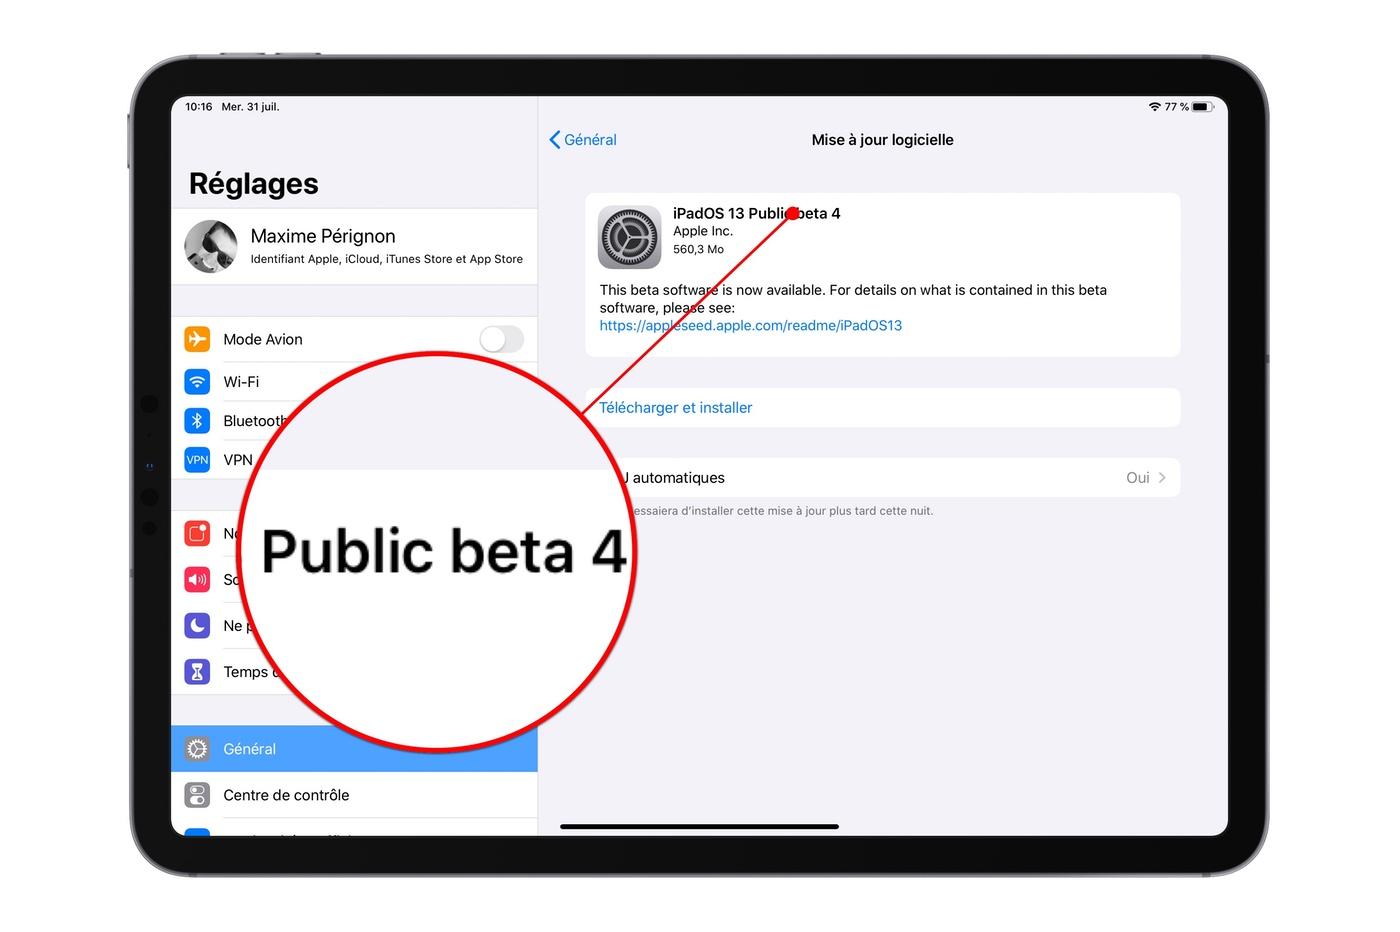 La quatrième bêta publique d'iOS 13 et iPadOS est disponible 1